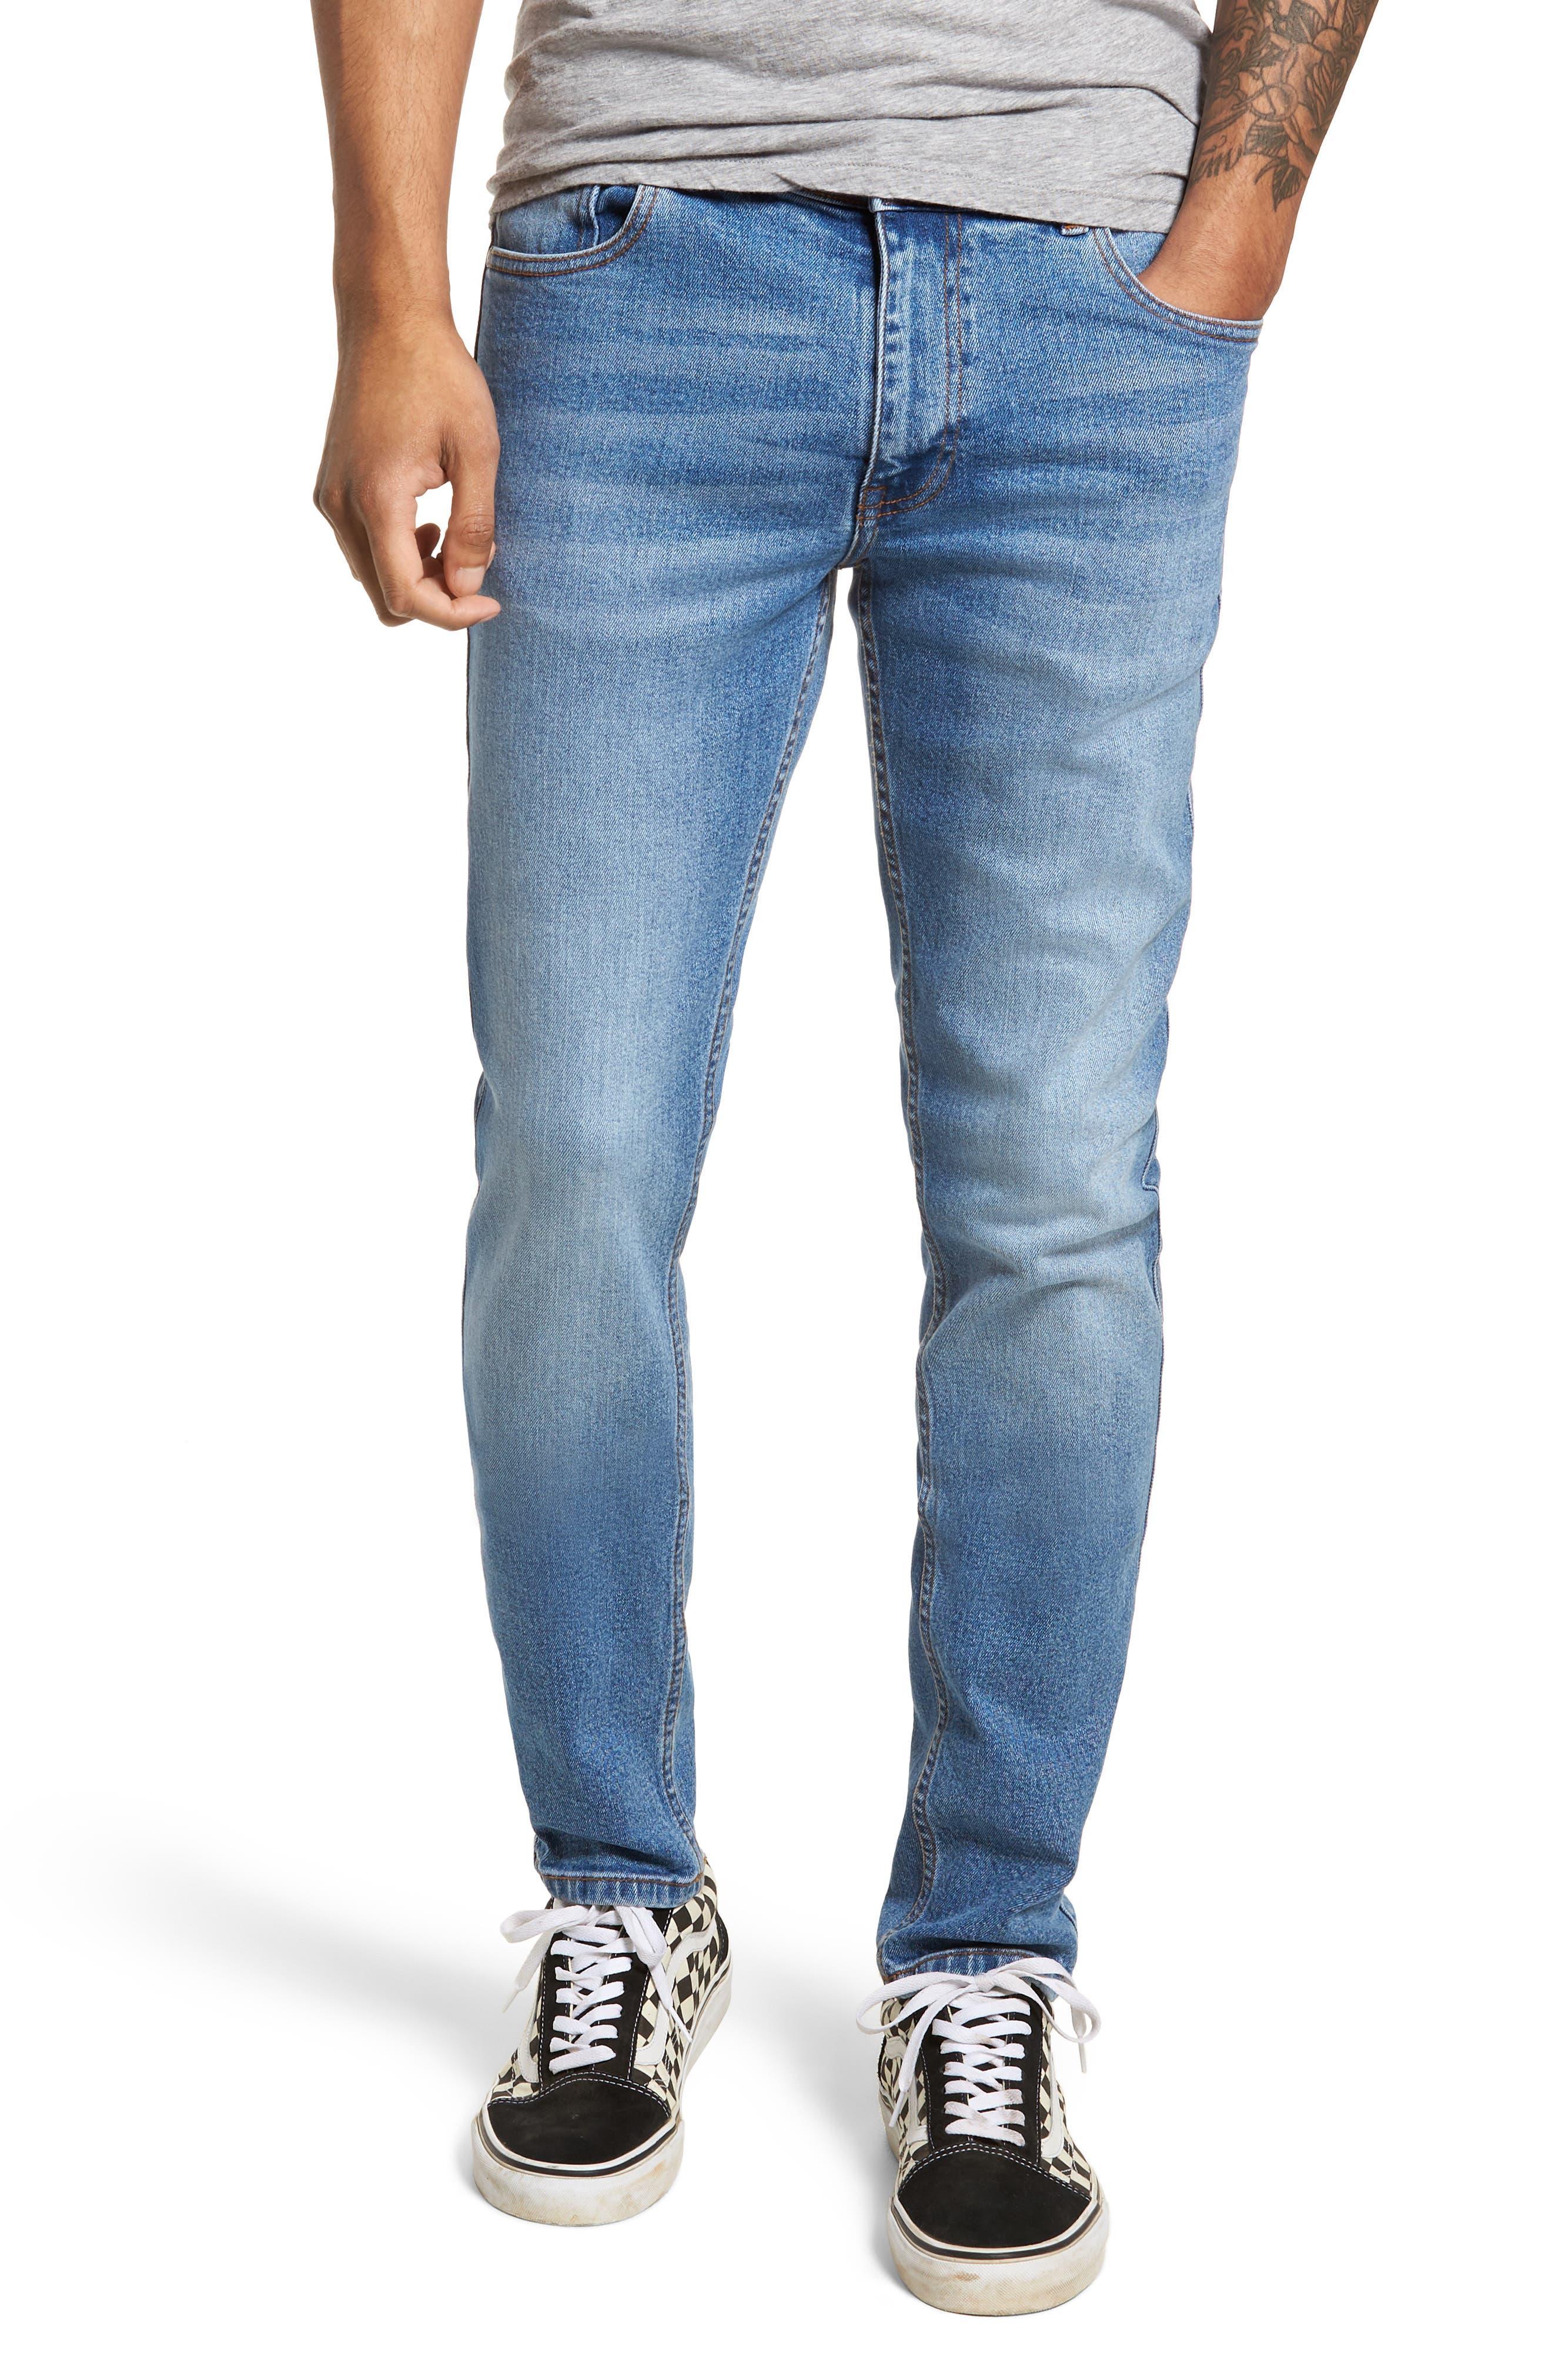 Clark Slim Straight Leg Jeans,                             Main thumbnail 1, color,                             Shaded Mid Blue